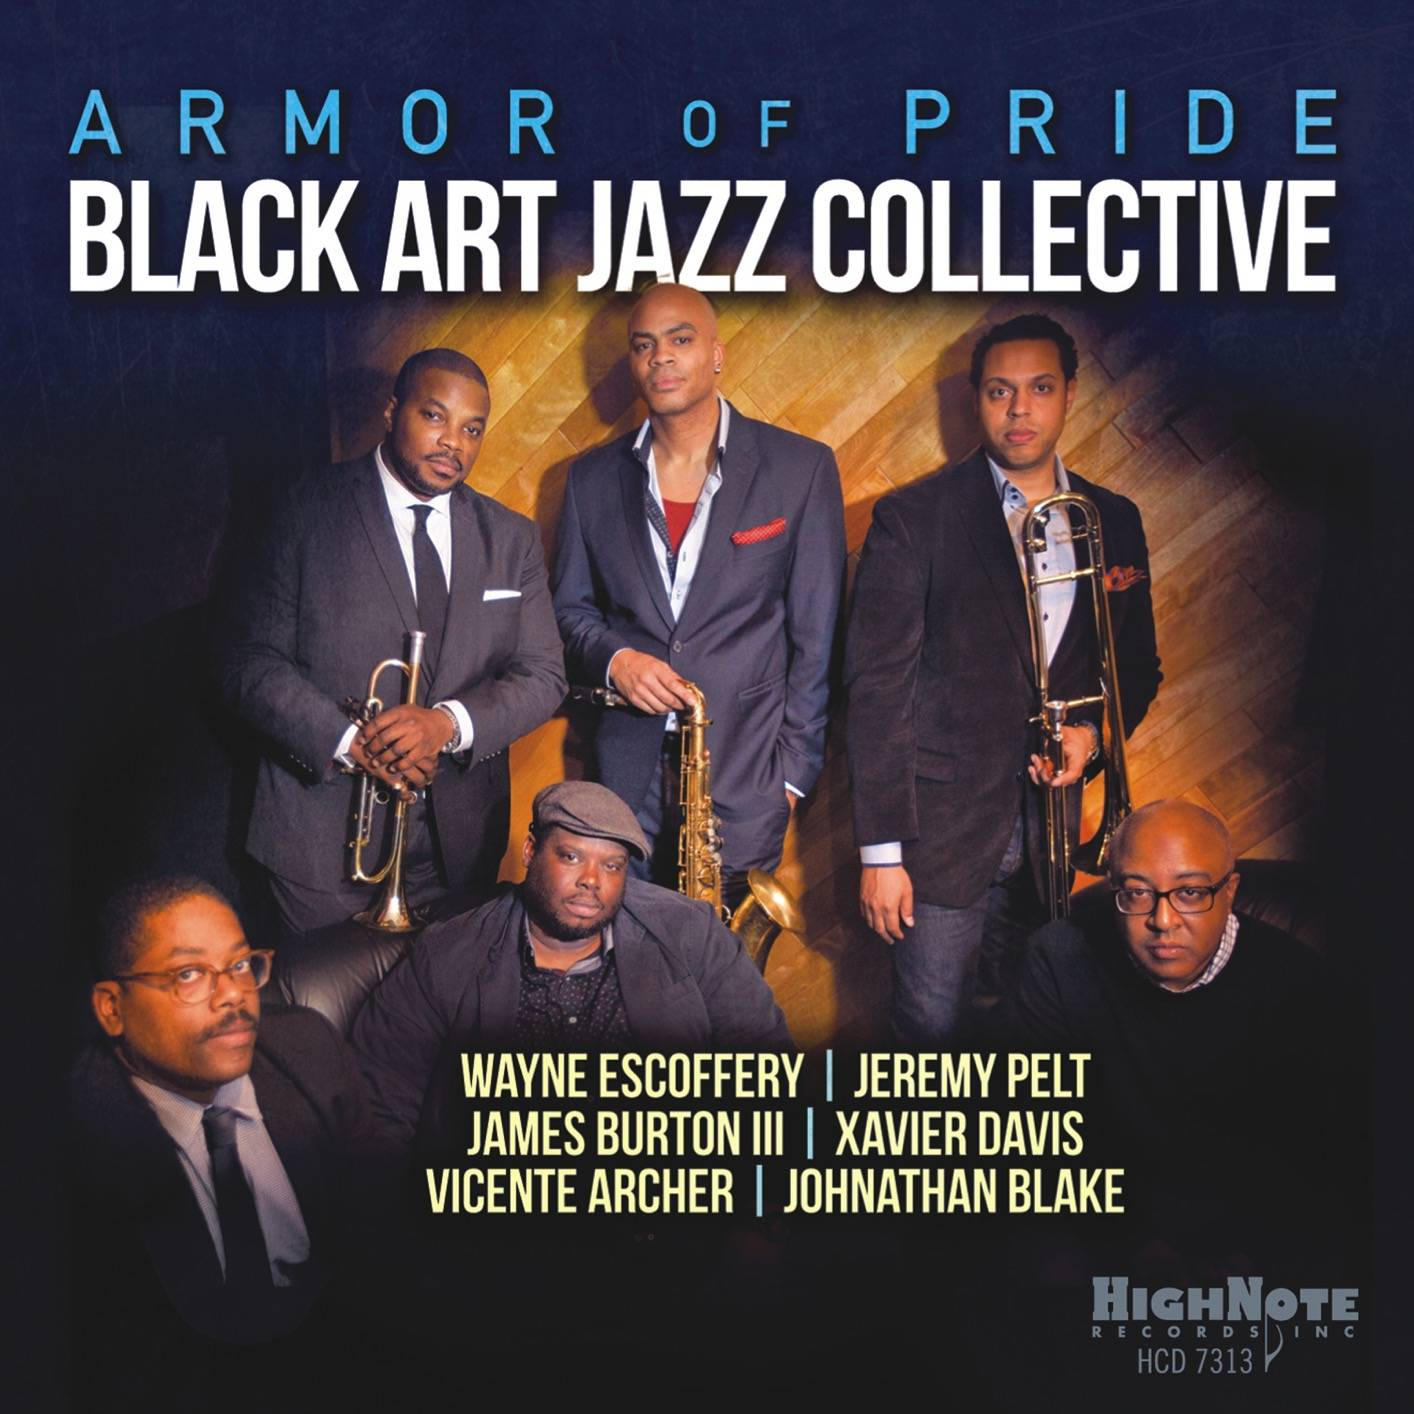 Black Art Jazz Collective - Armor of Pride (2018) [Official Digital Download 24/96]